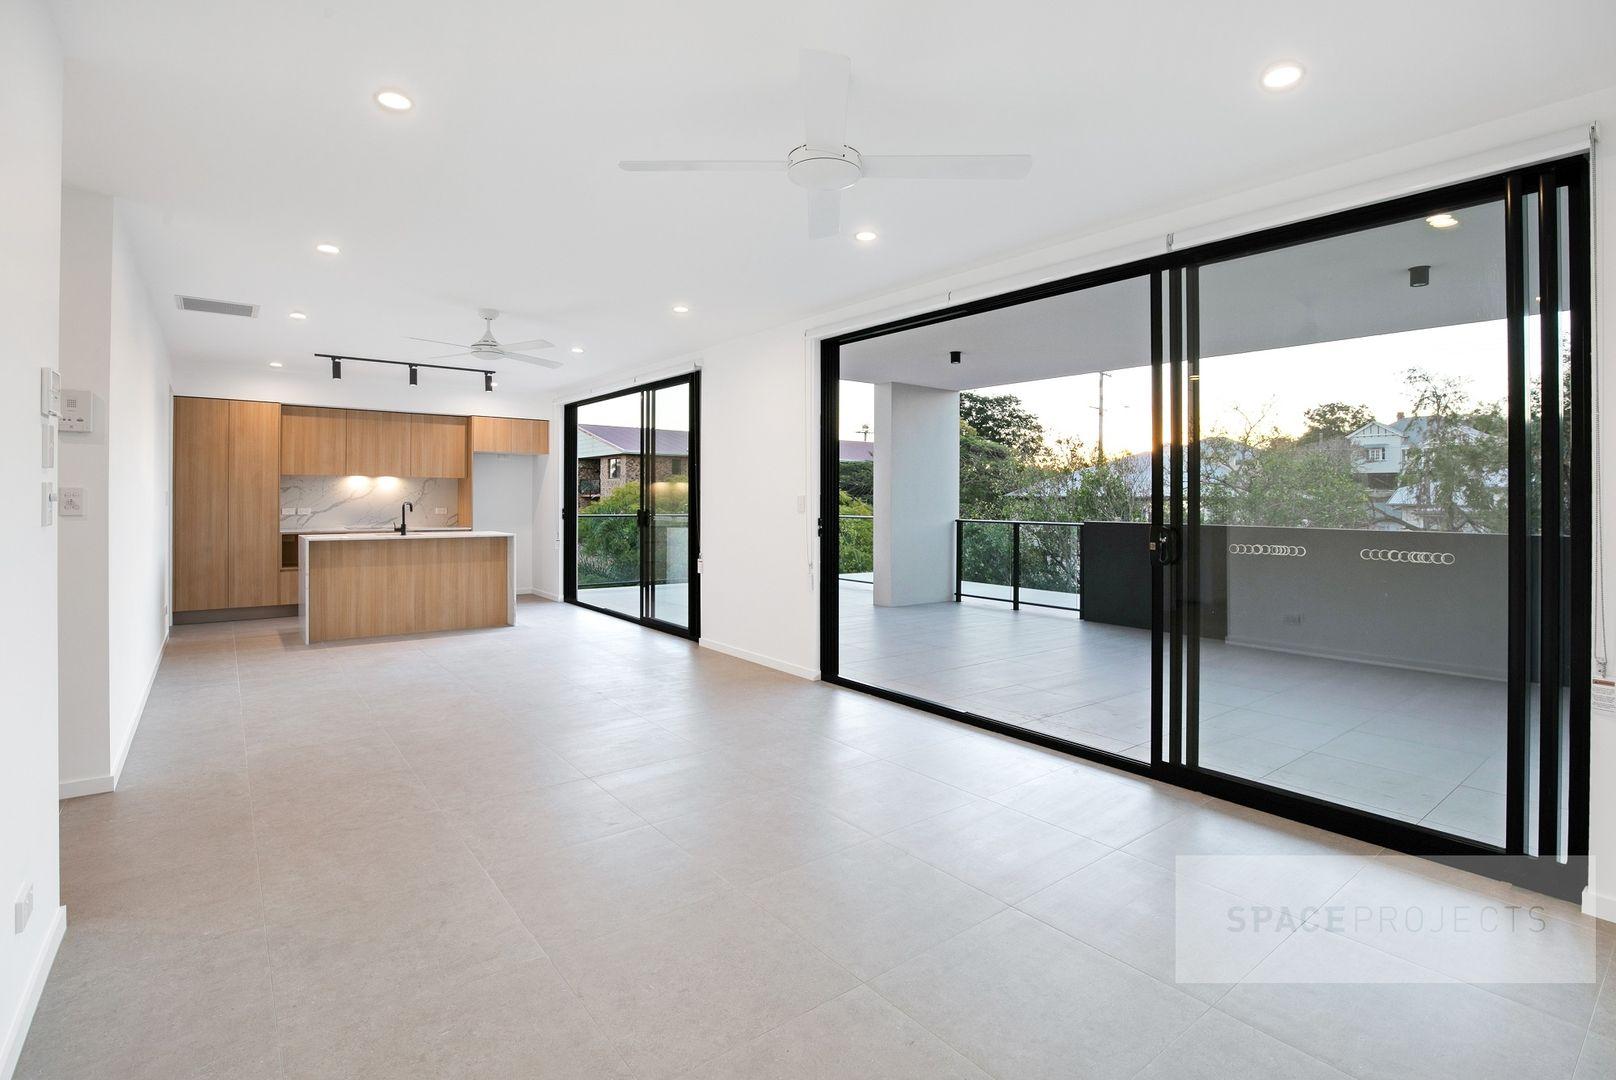 14/4 Shirley Street, Indooroopilly QLD 4068, Image 1